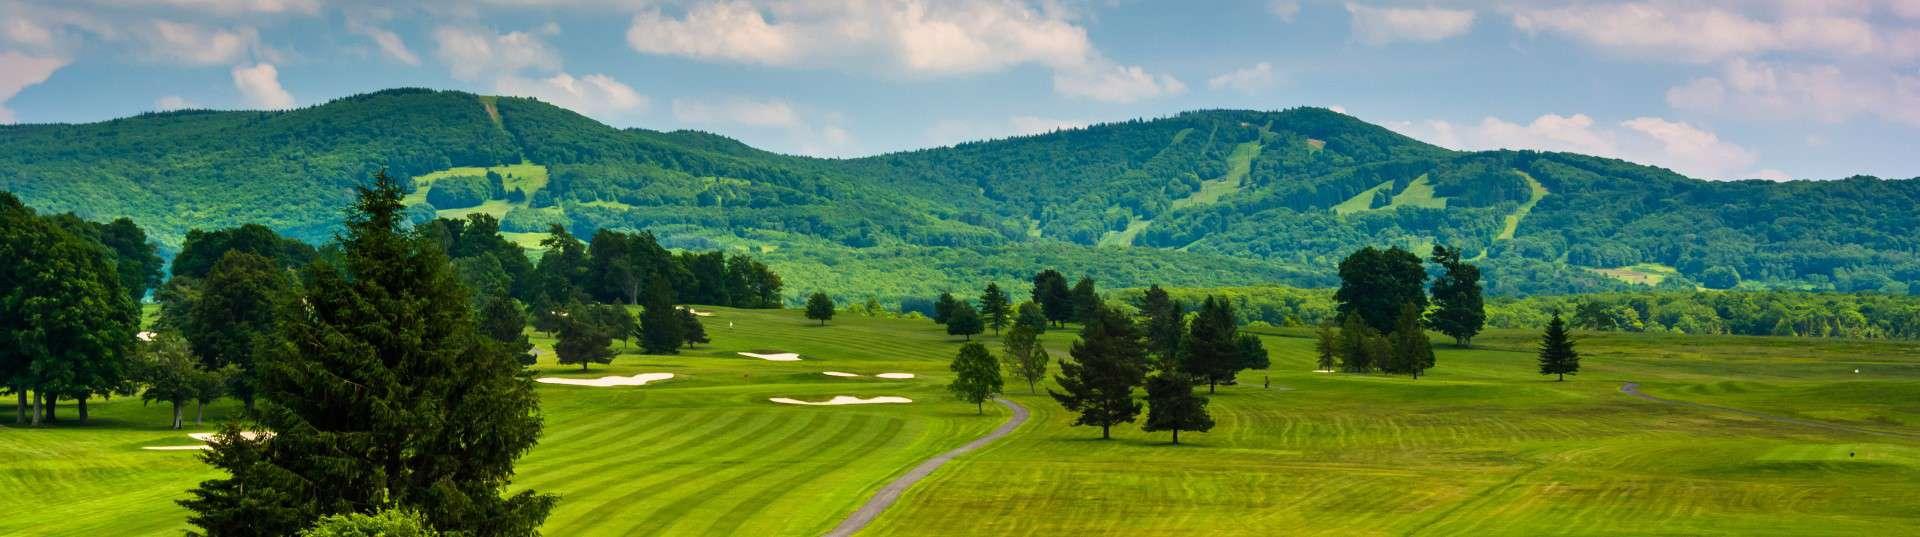 Canaan Valley Resort, Davis, West Virginia - Golf course